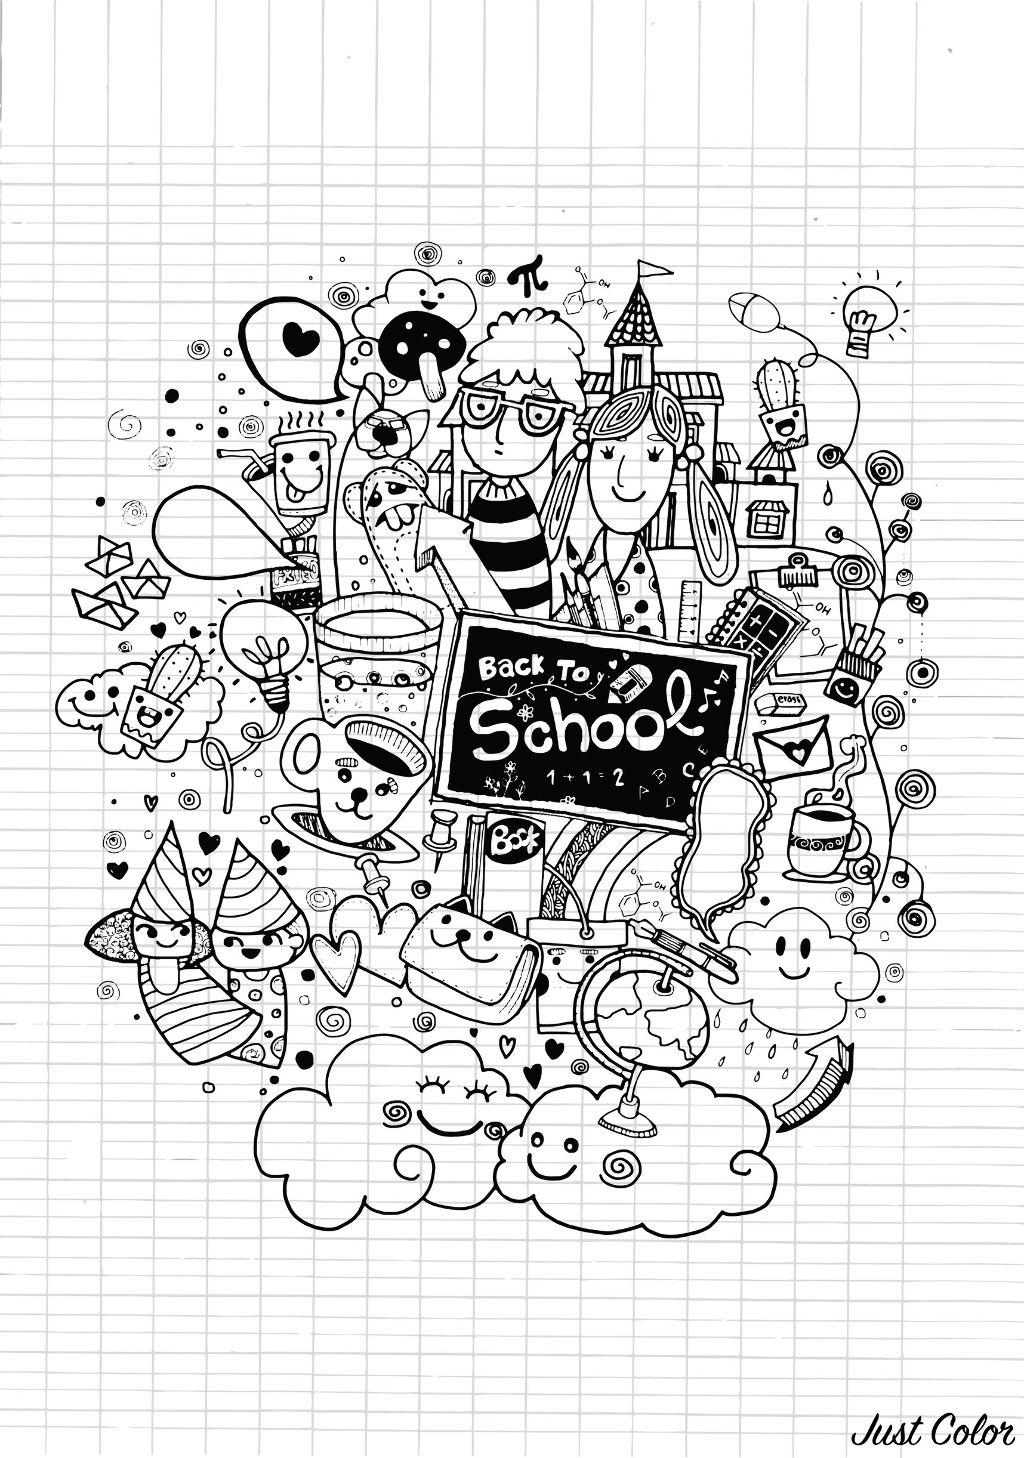 Disegni da colorare per adulti : Doodle art / Doodling - 24